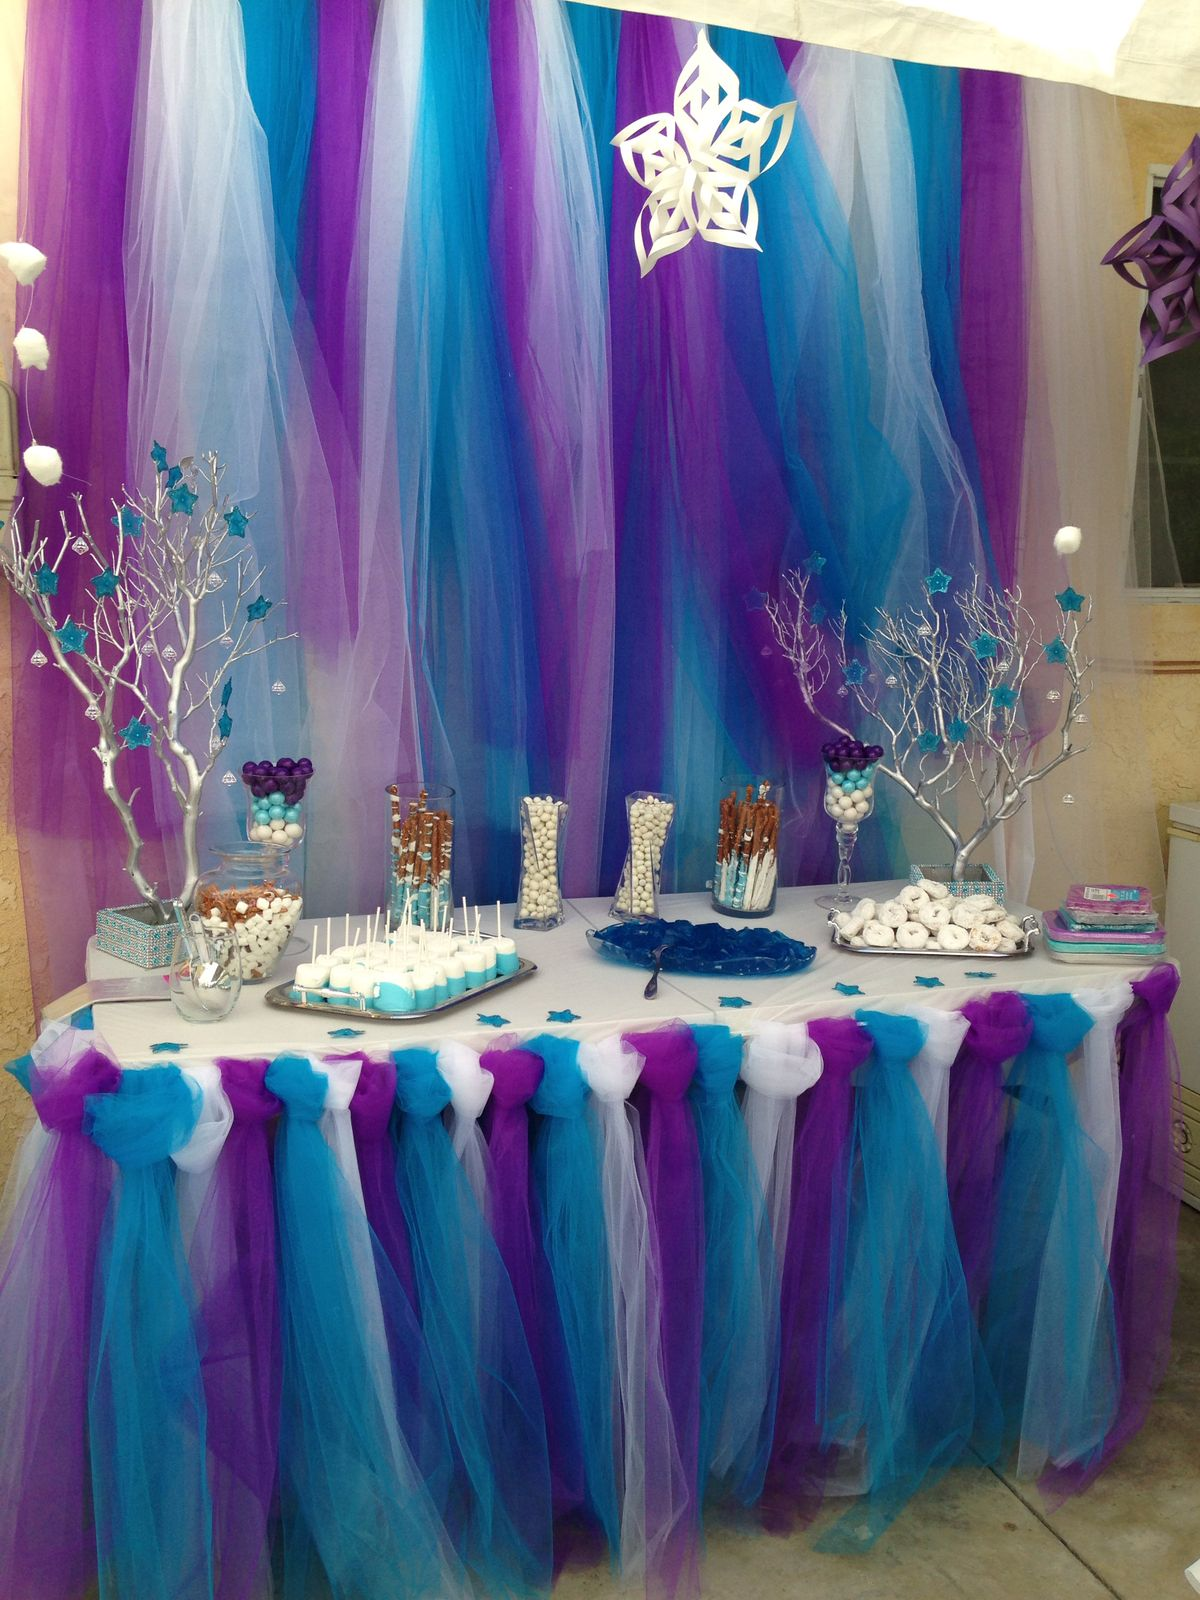 Usa tul para decorar tus fiestas dale detalles - Decoracion para foto ...